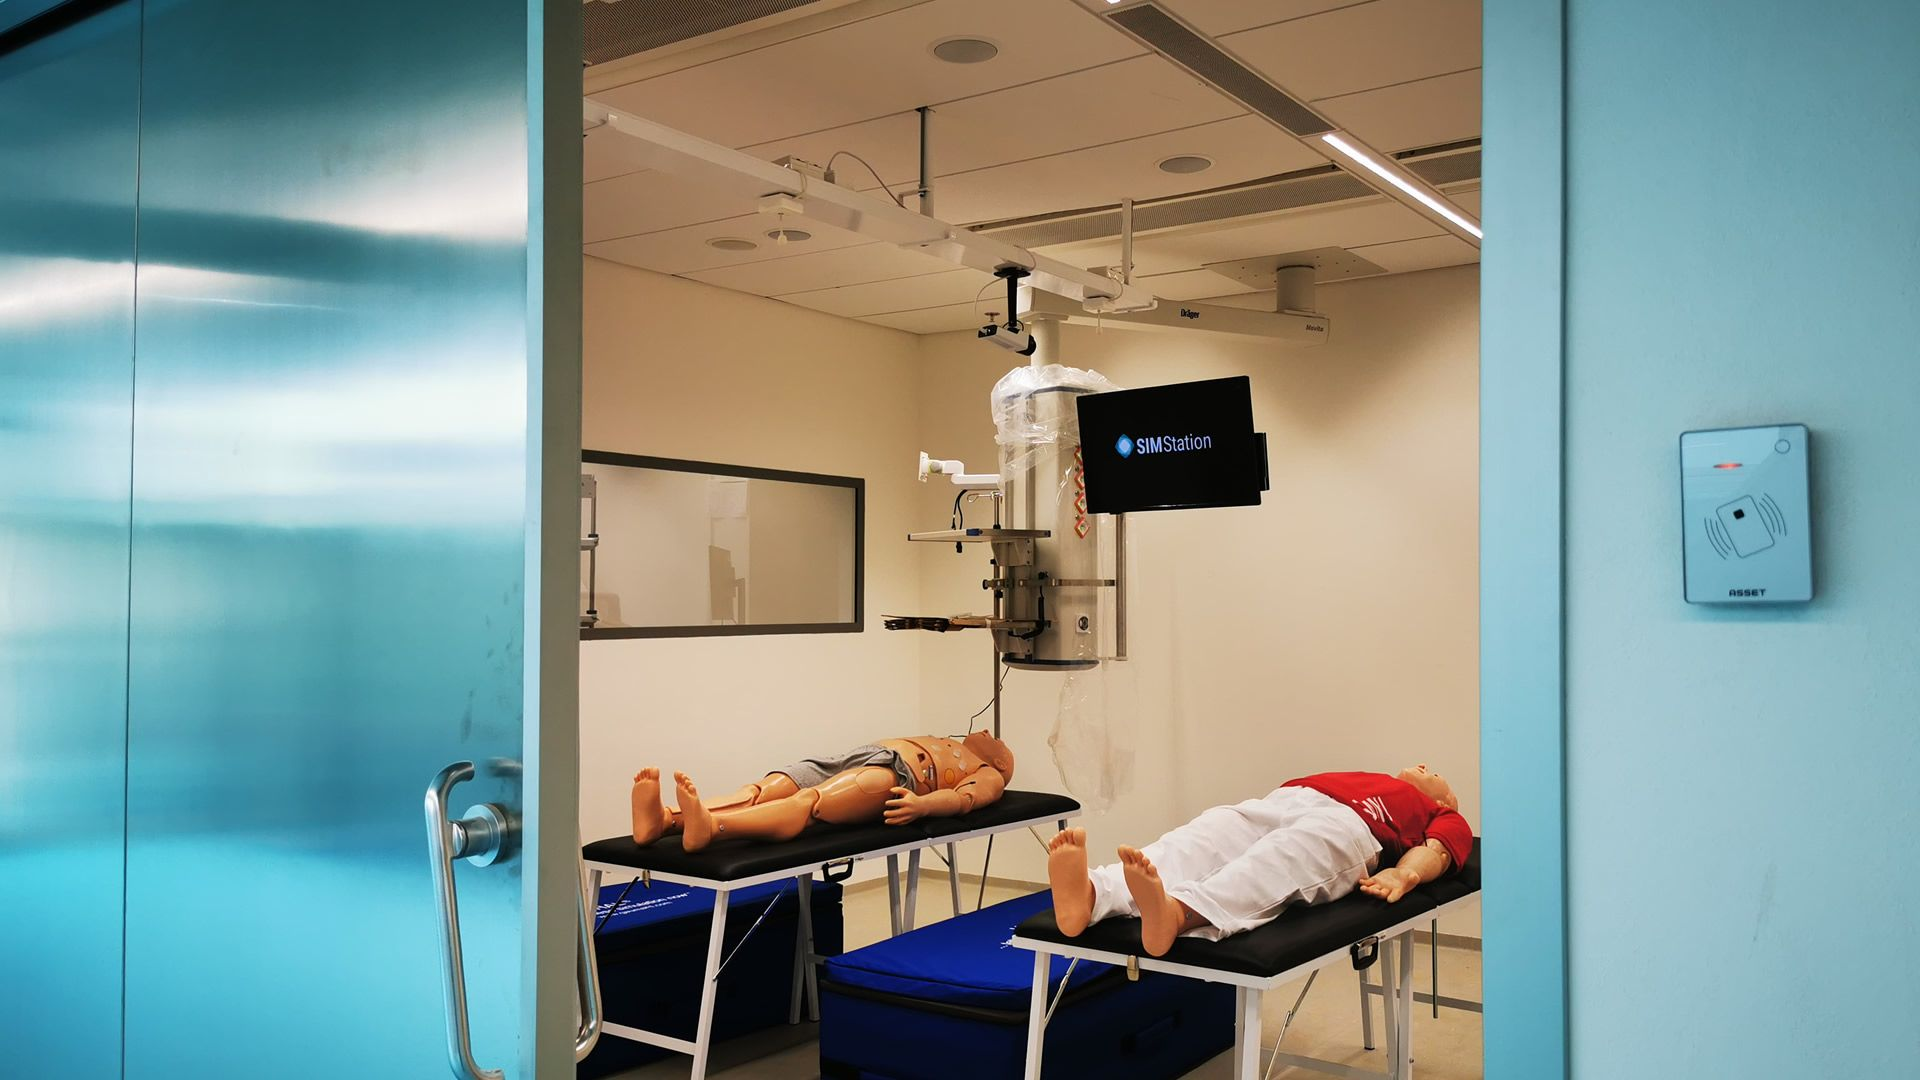 https://cms.simstation.comMasaryk University Simulation Center